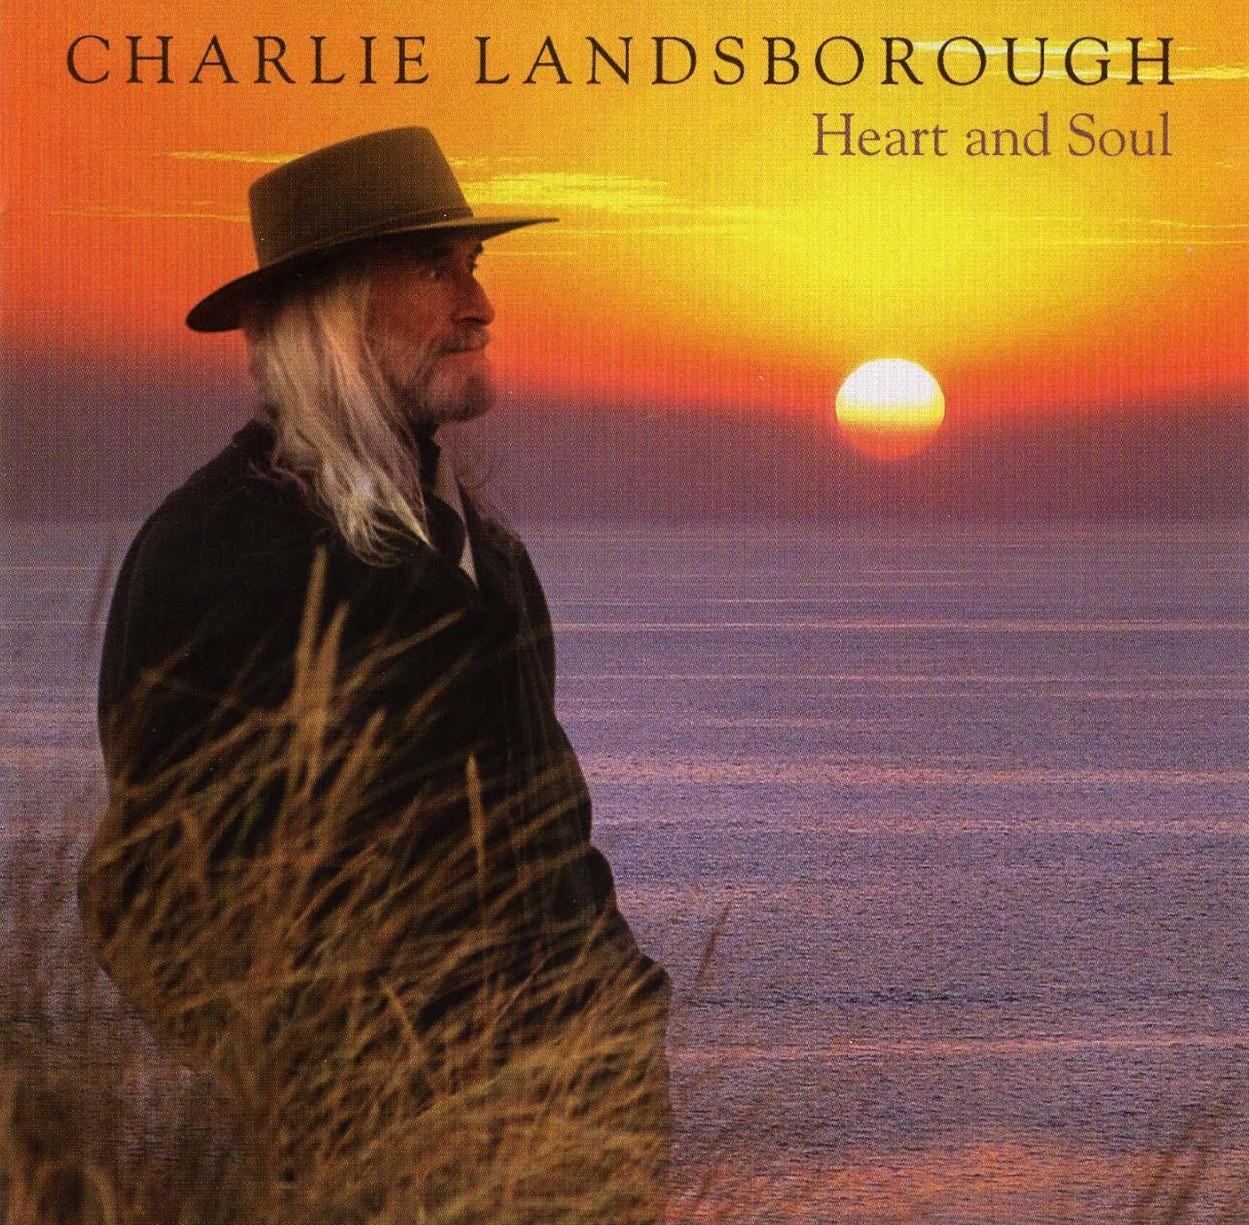 Album Charlie Landsborough – Heart and Soul [2006]